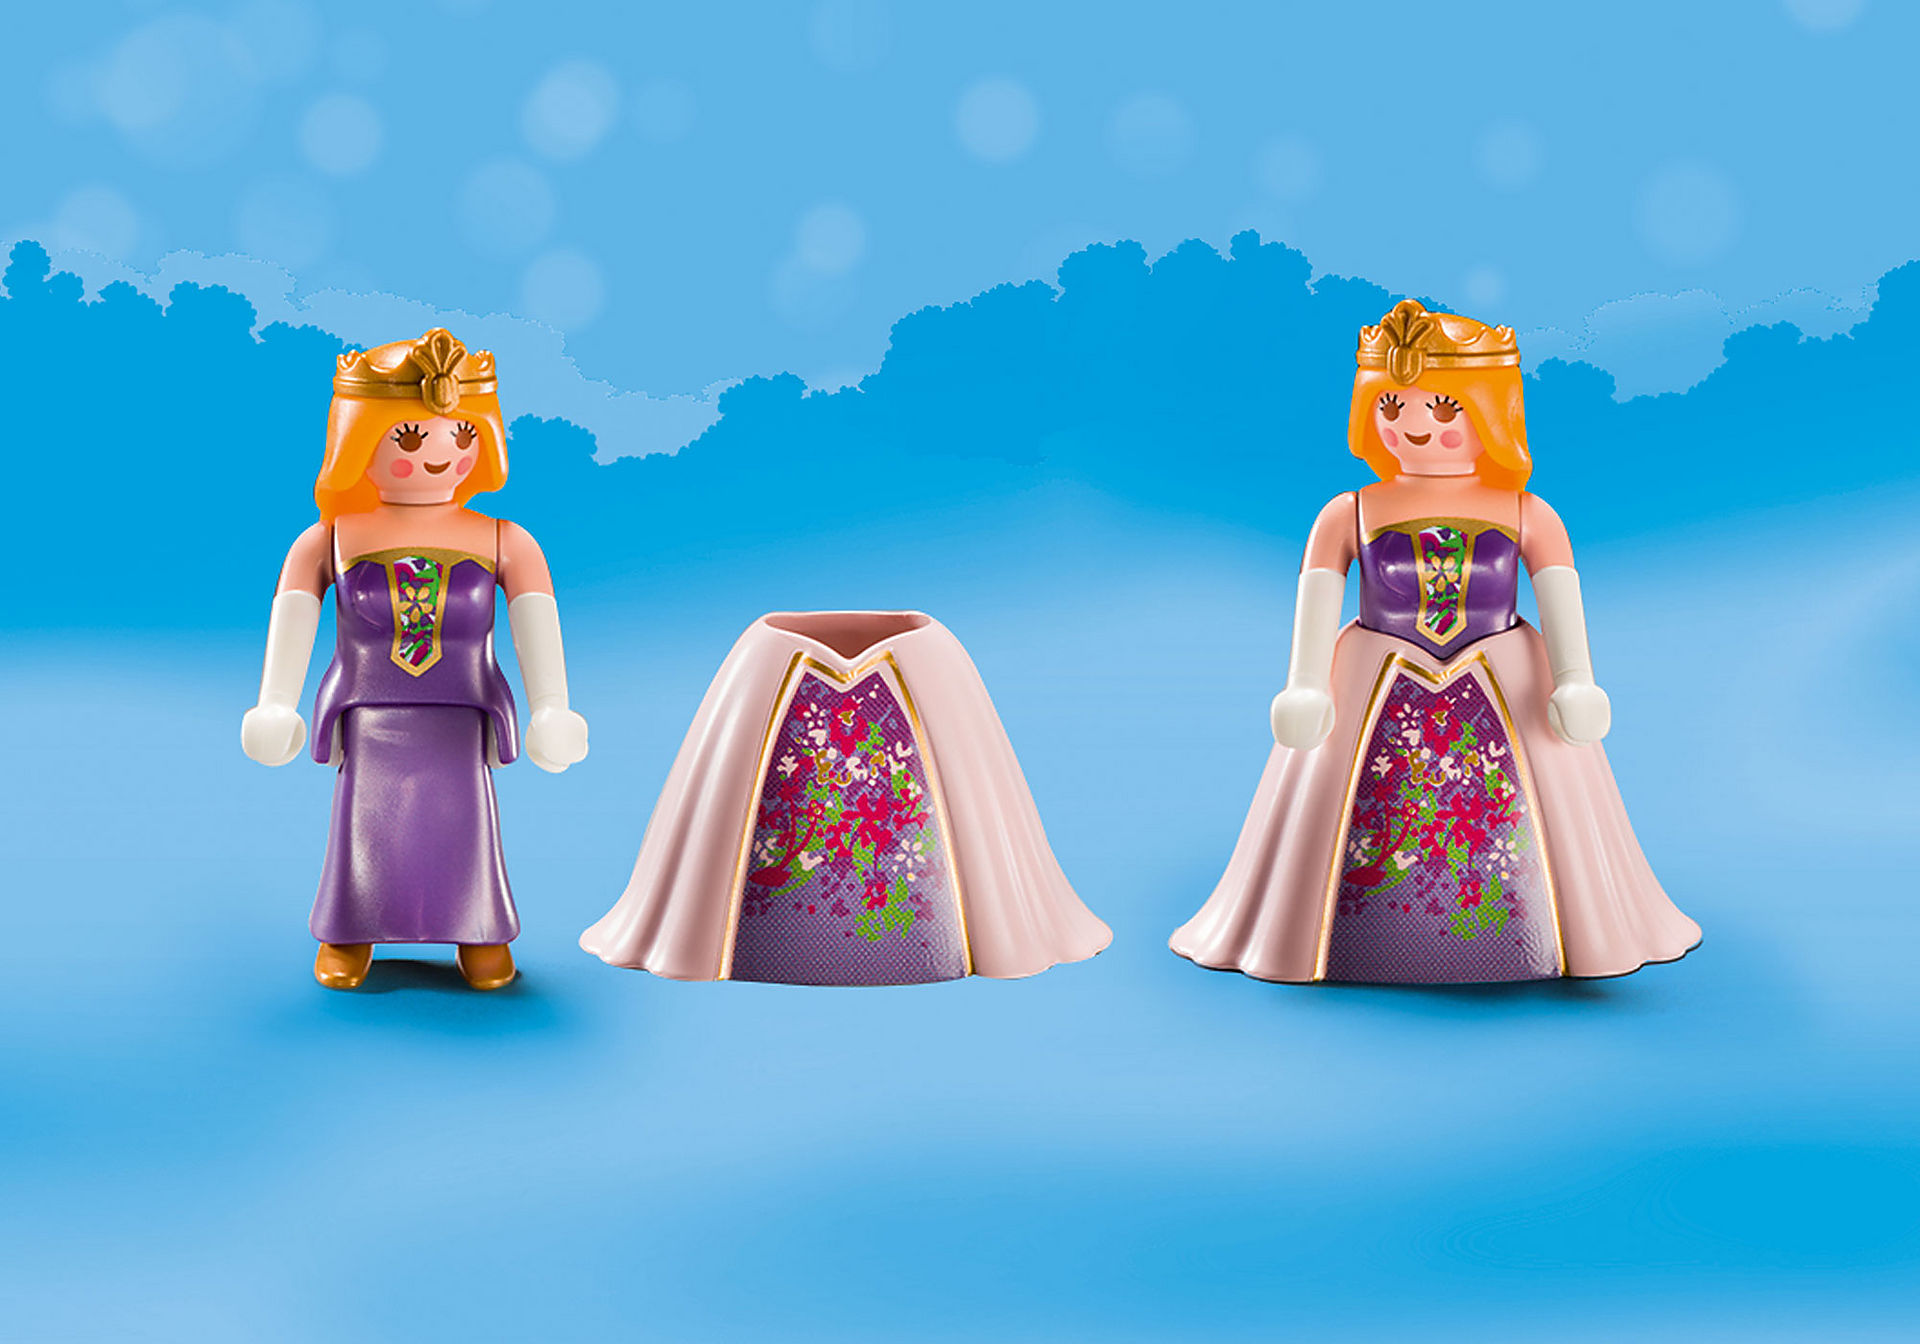 70107 Maletín grande Princesas y Unicornio zoom image4